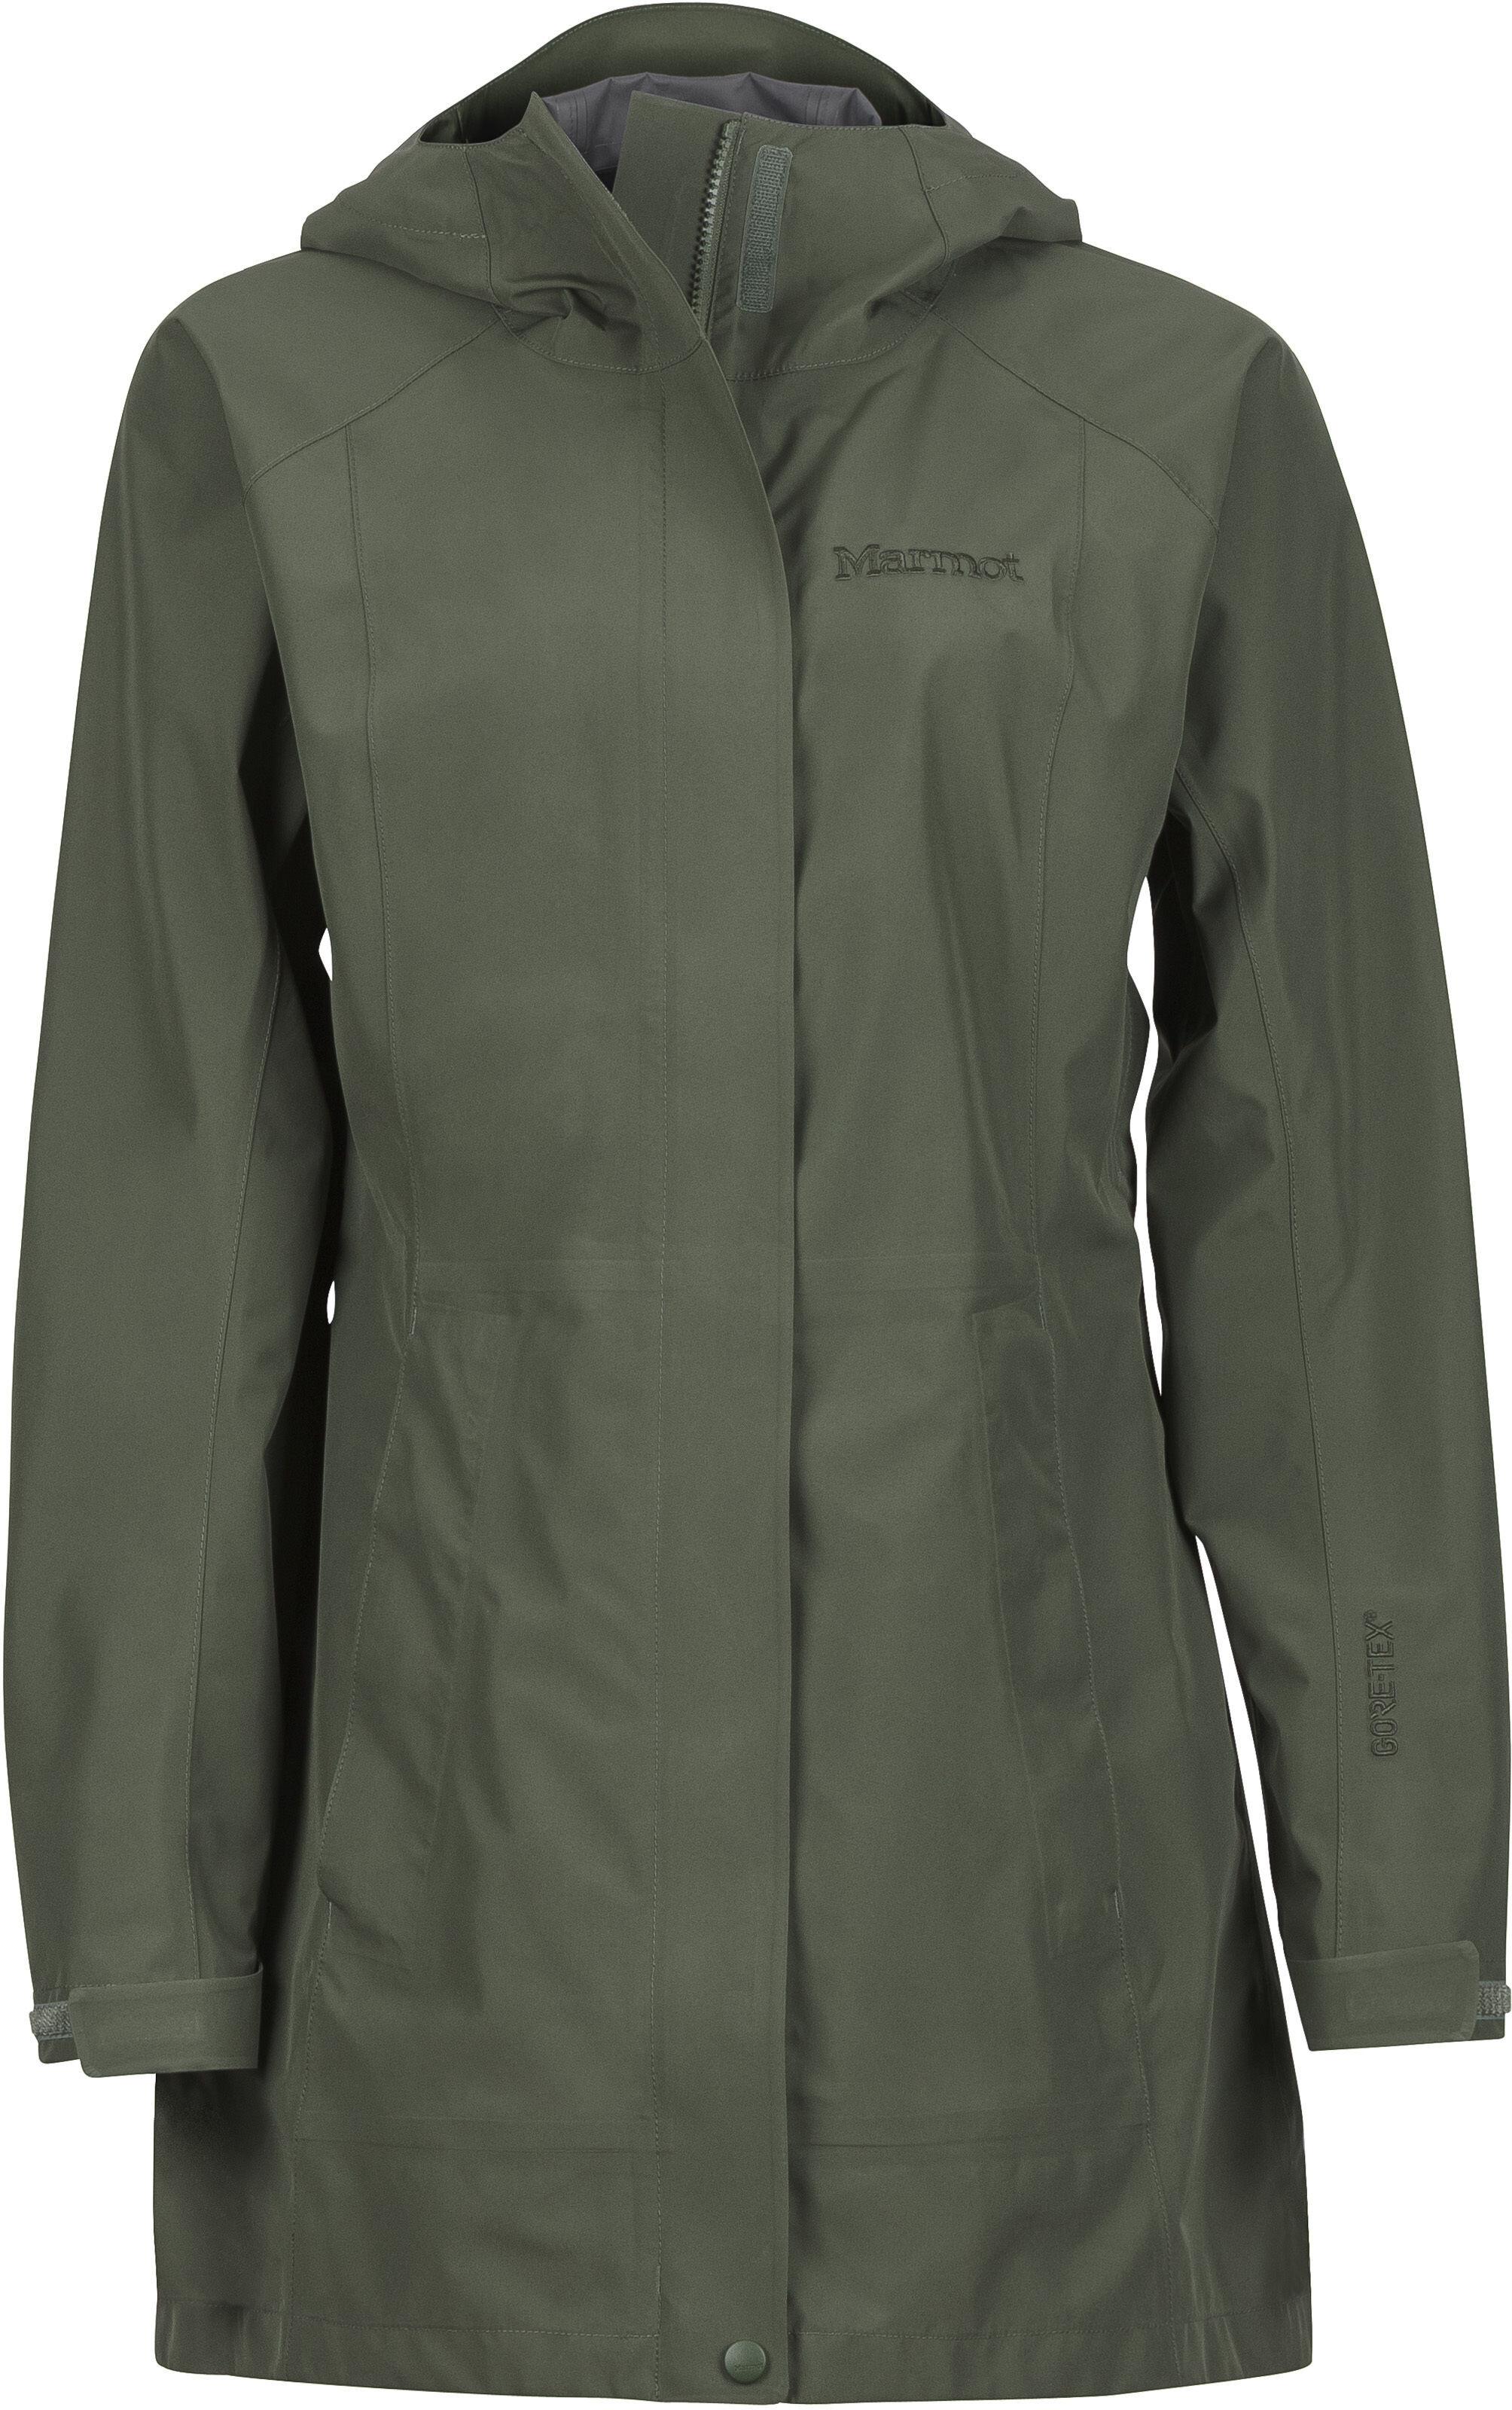 Marmot Women S Alexie Jacket: Marmot Essential Jacket Women Crocodile